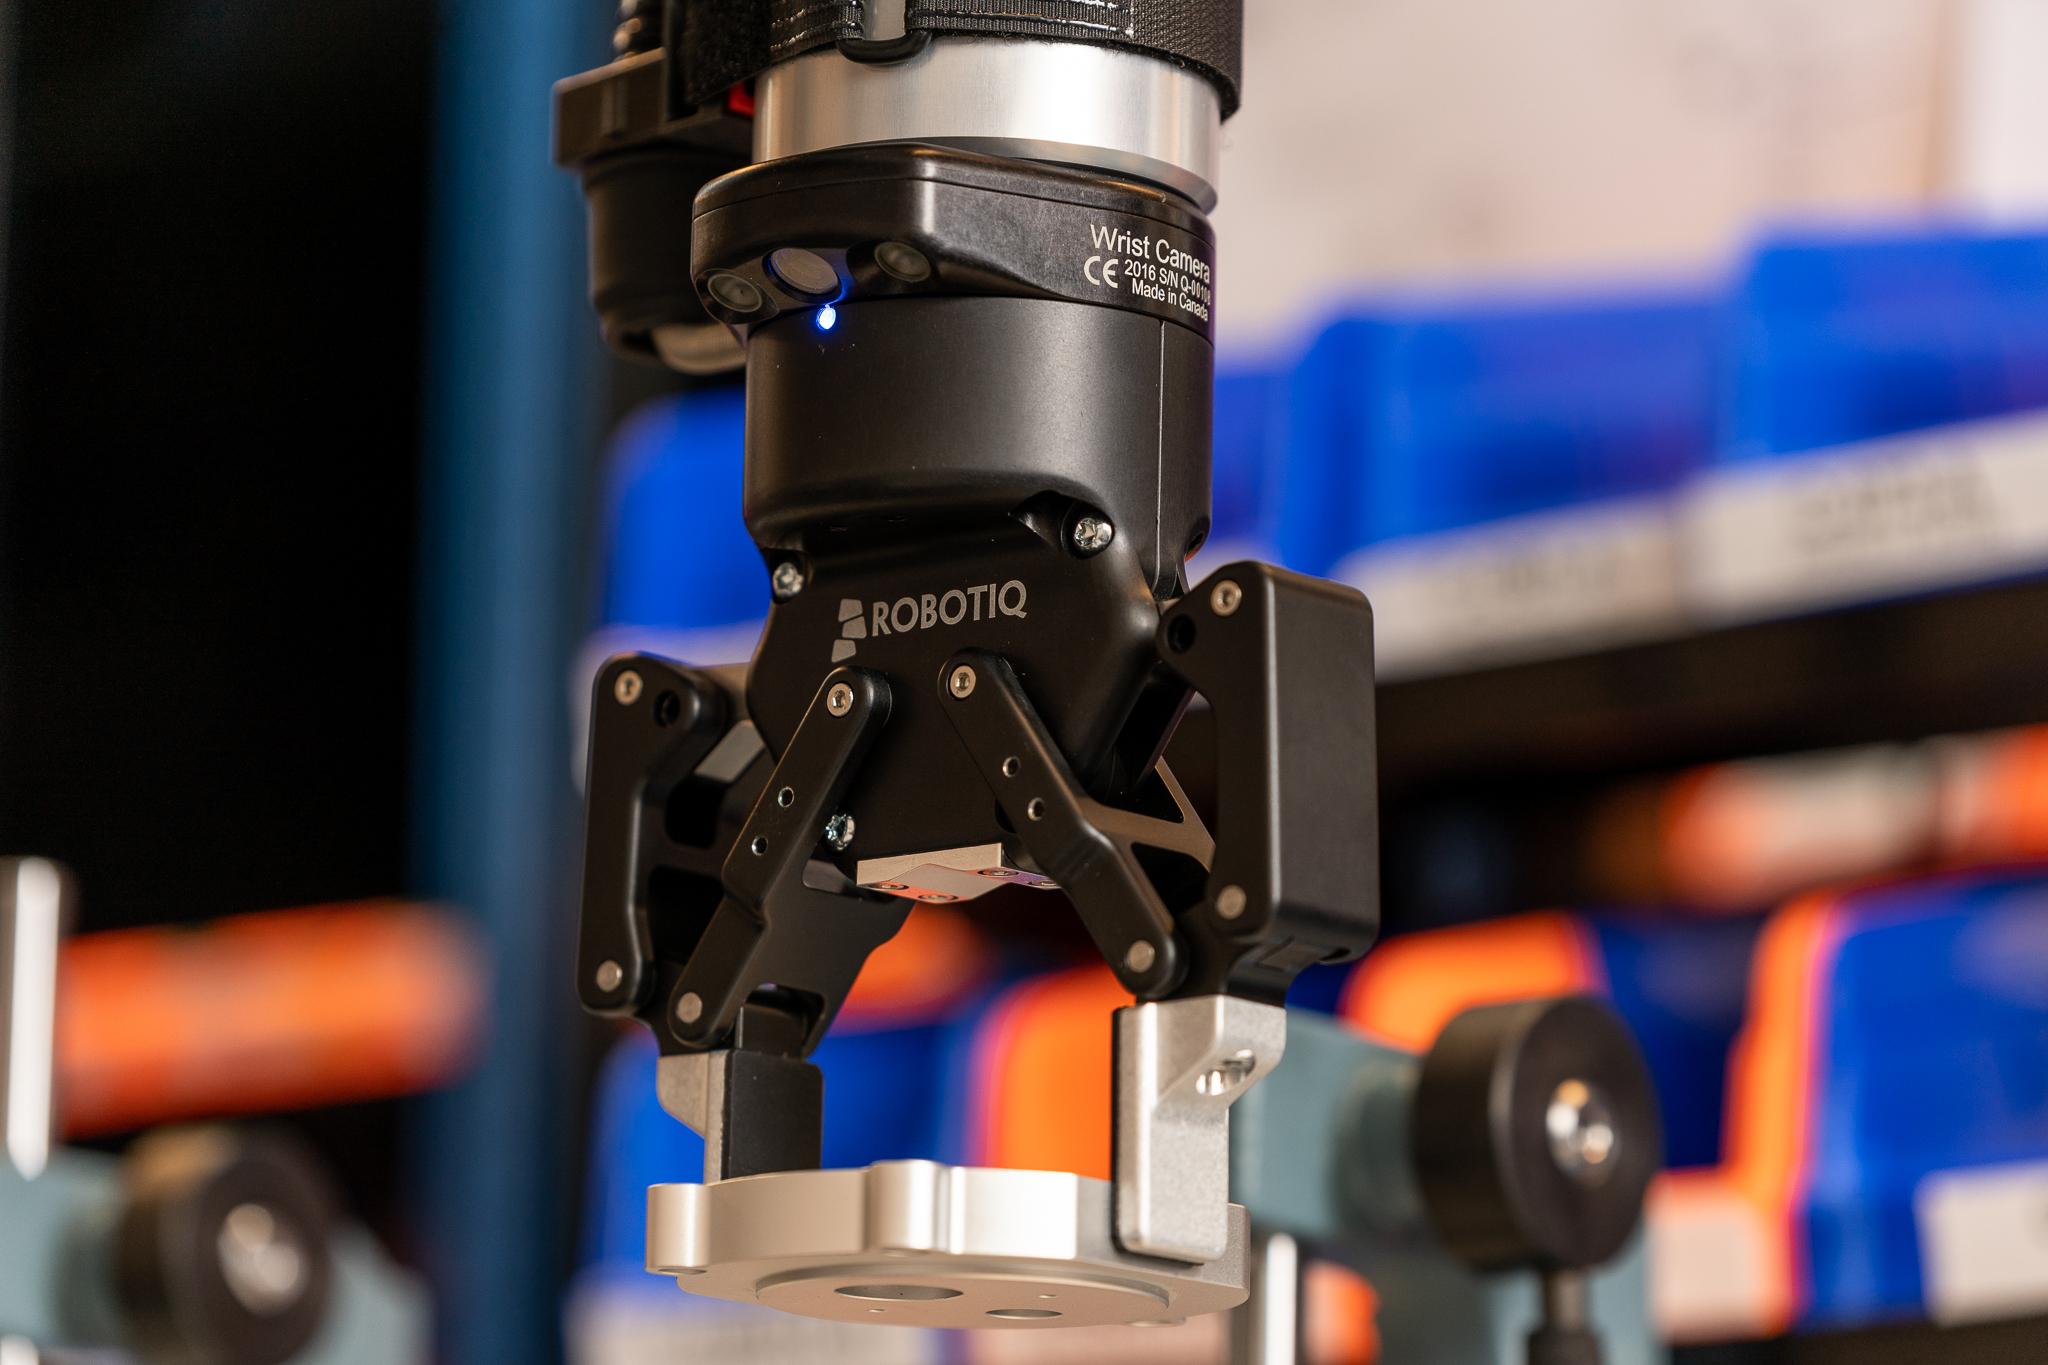 5 Ways Robotics Are Used in Medicine and Healthcare